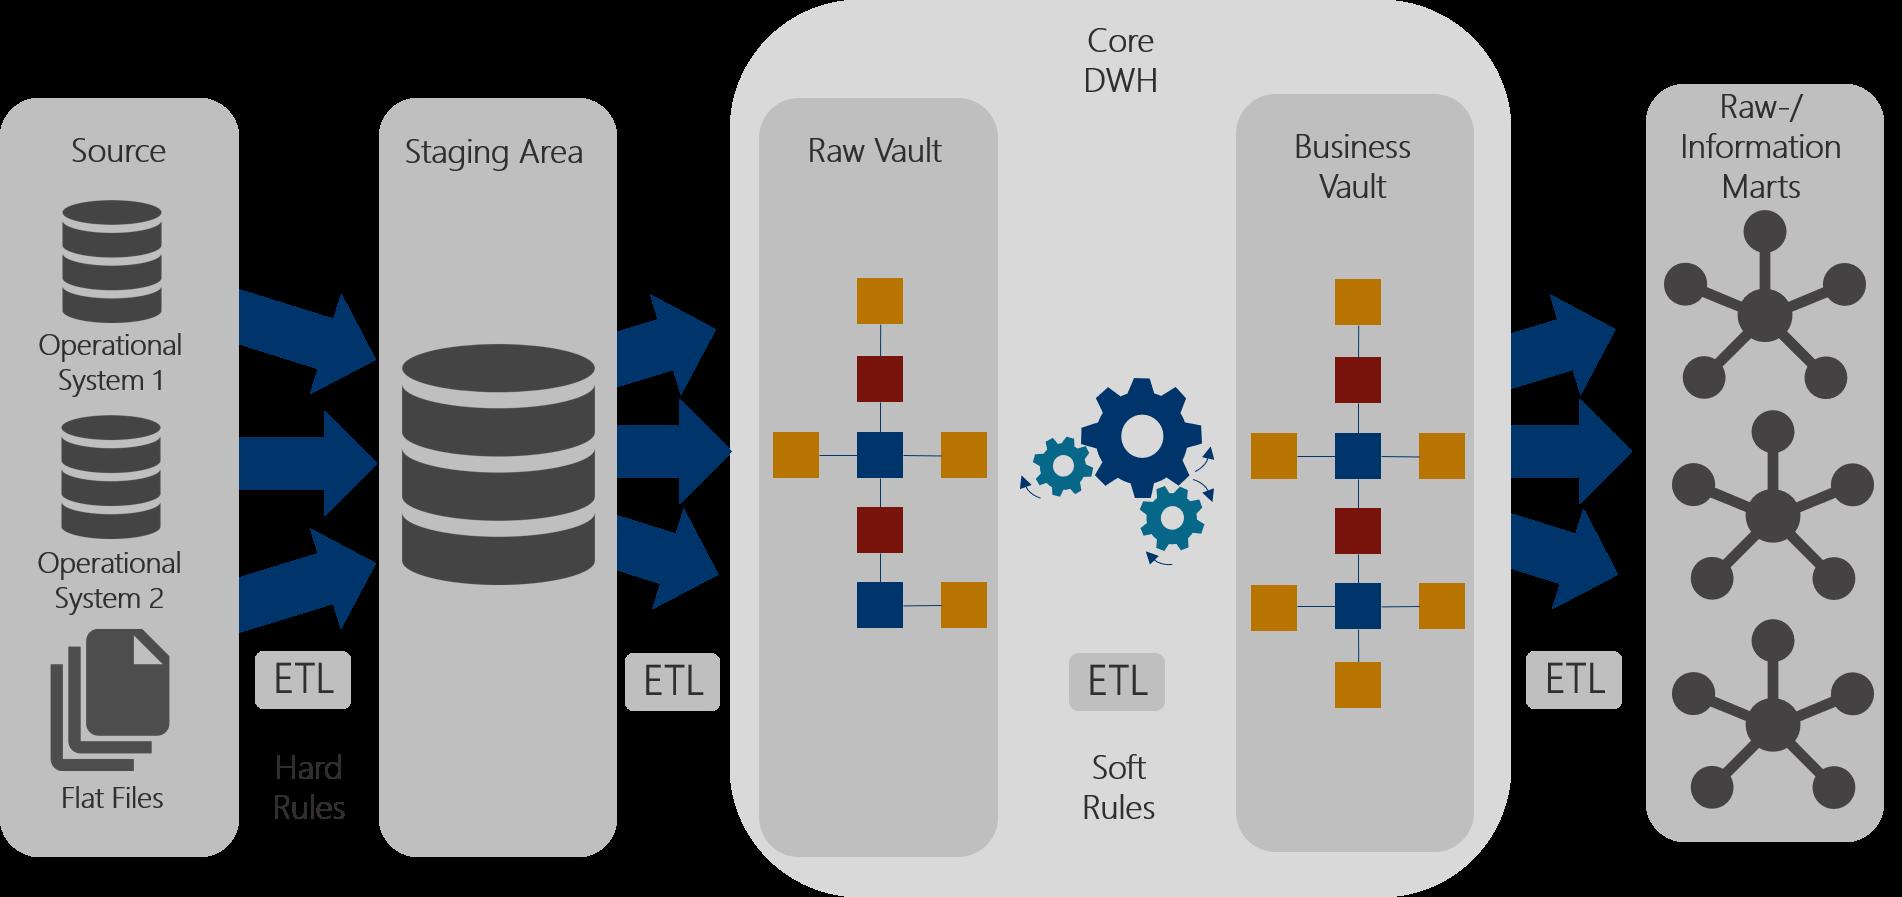 Abbildung 4: Architektur Data Vault 2.0